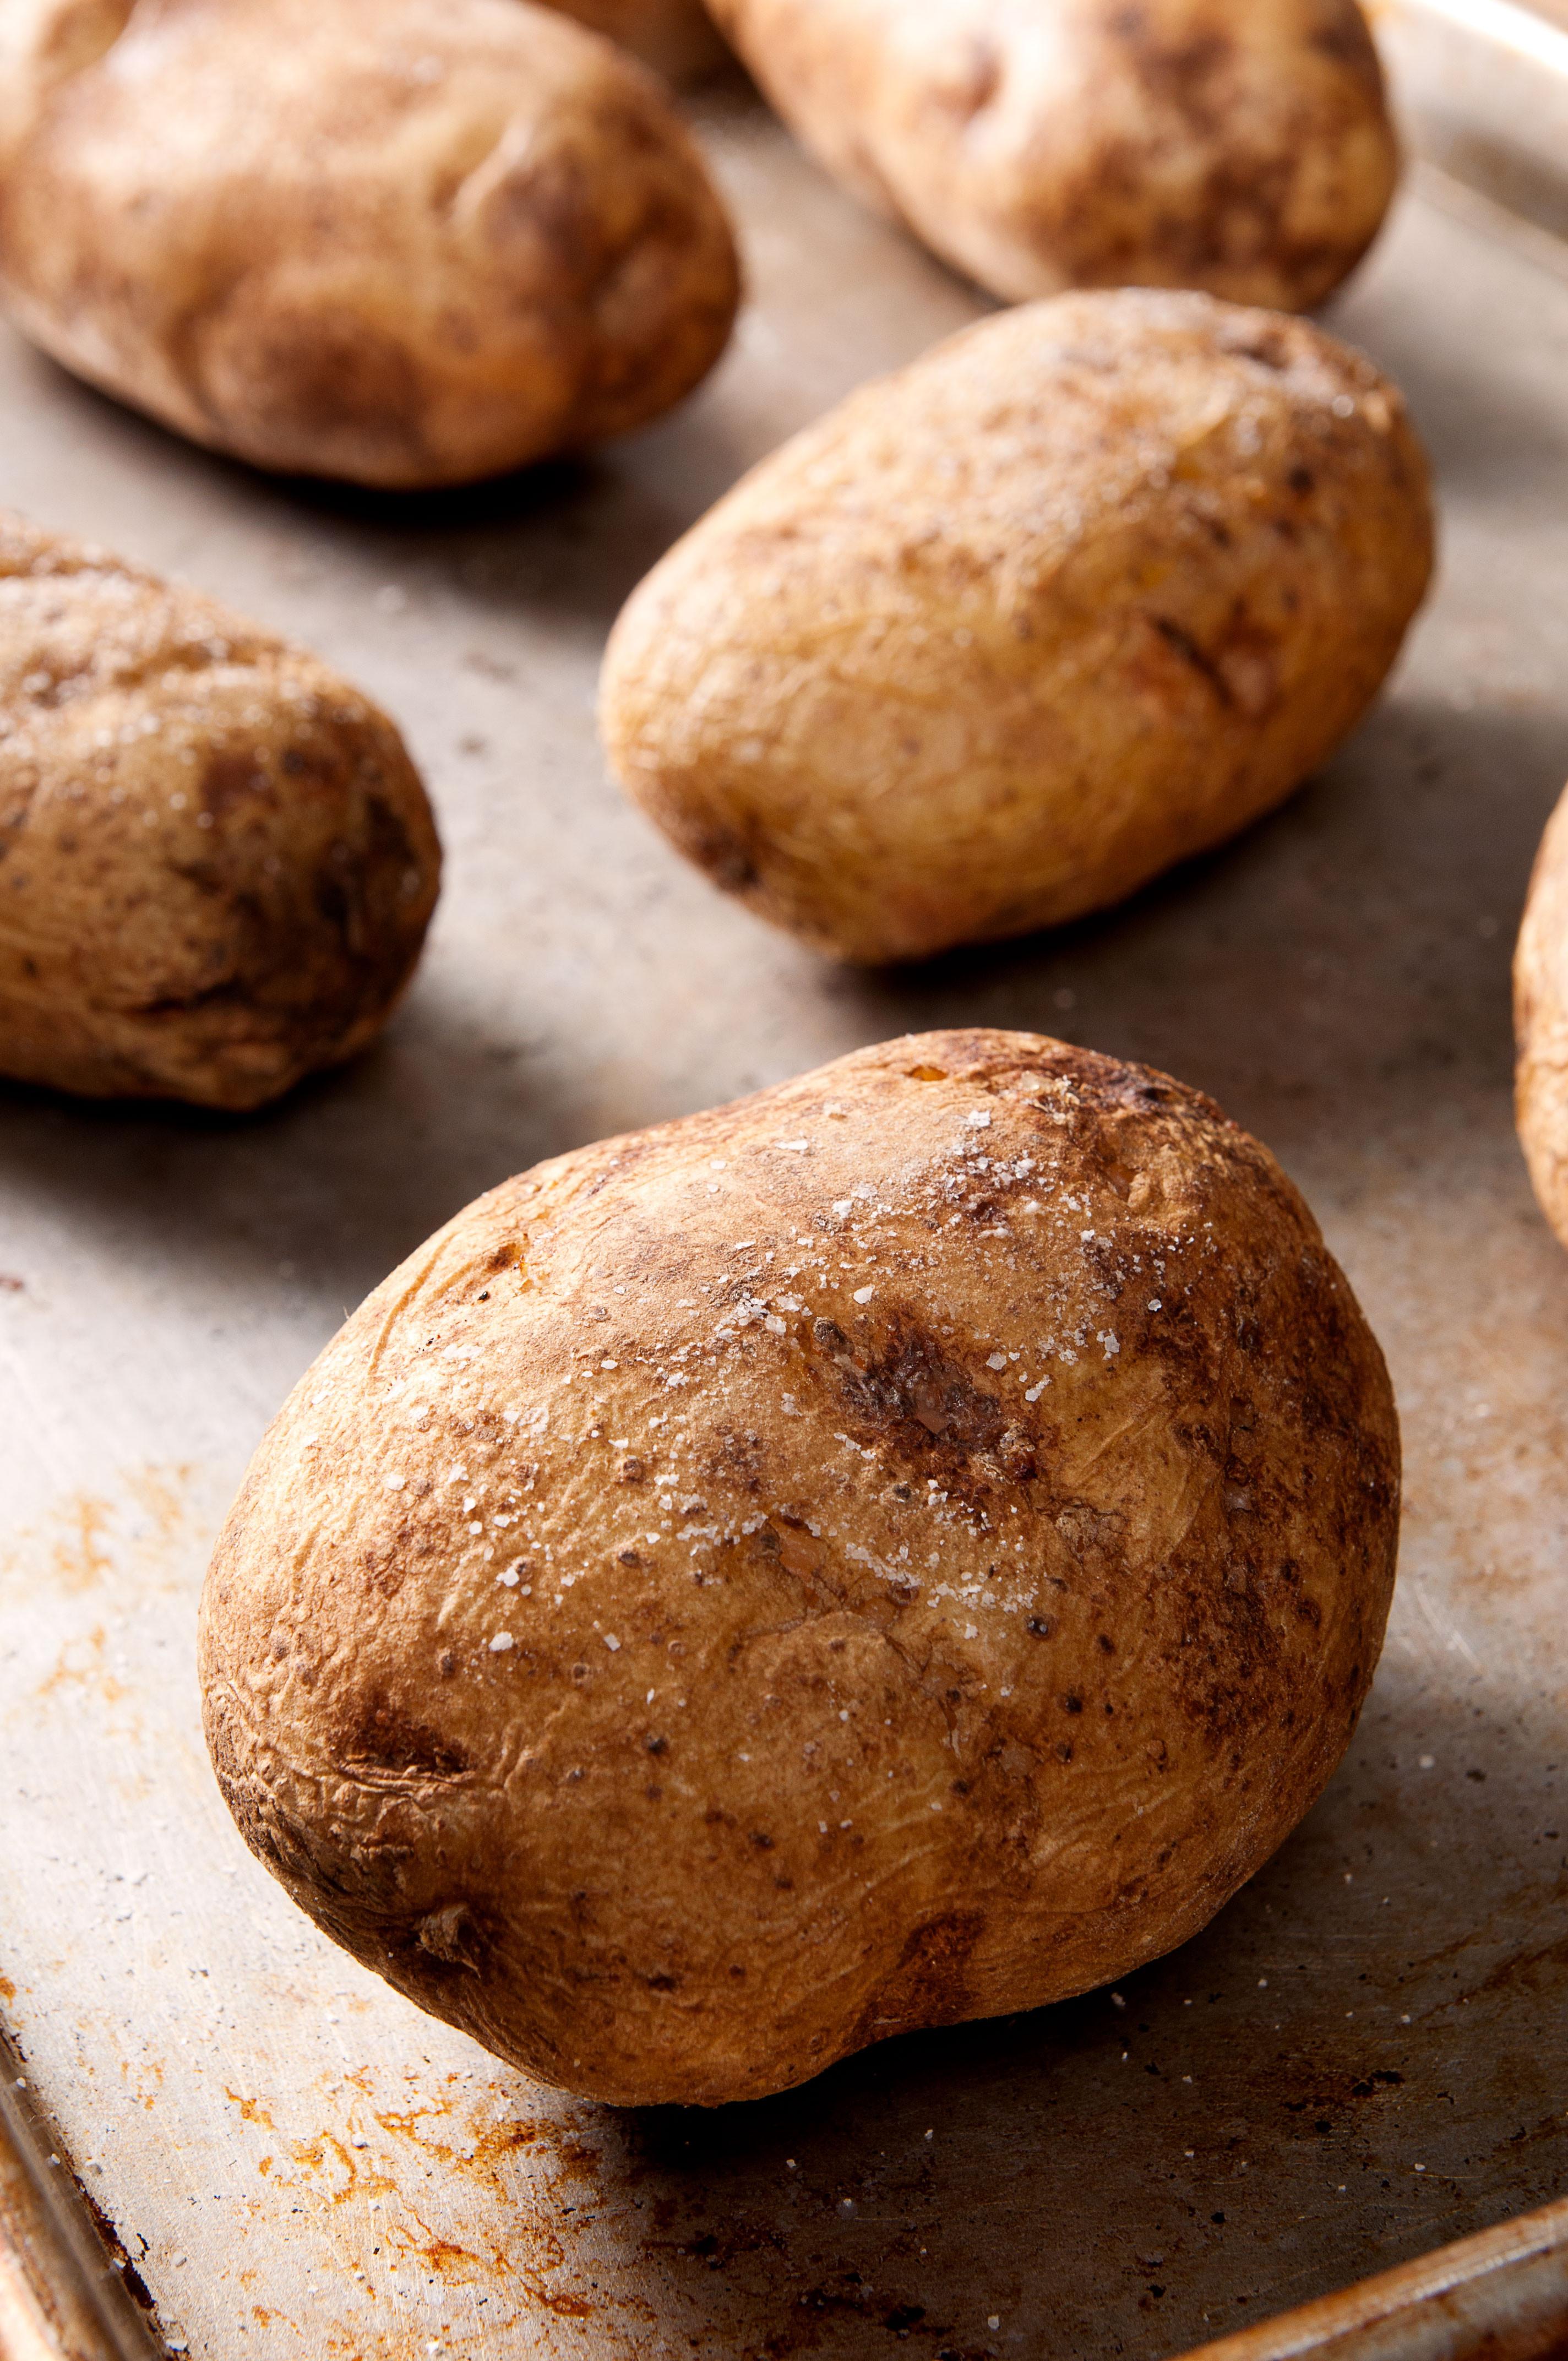 Baked Potato Alton Brown  Perfect Baked Potato & My Bus Adventures I bake he shoots